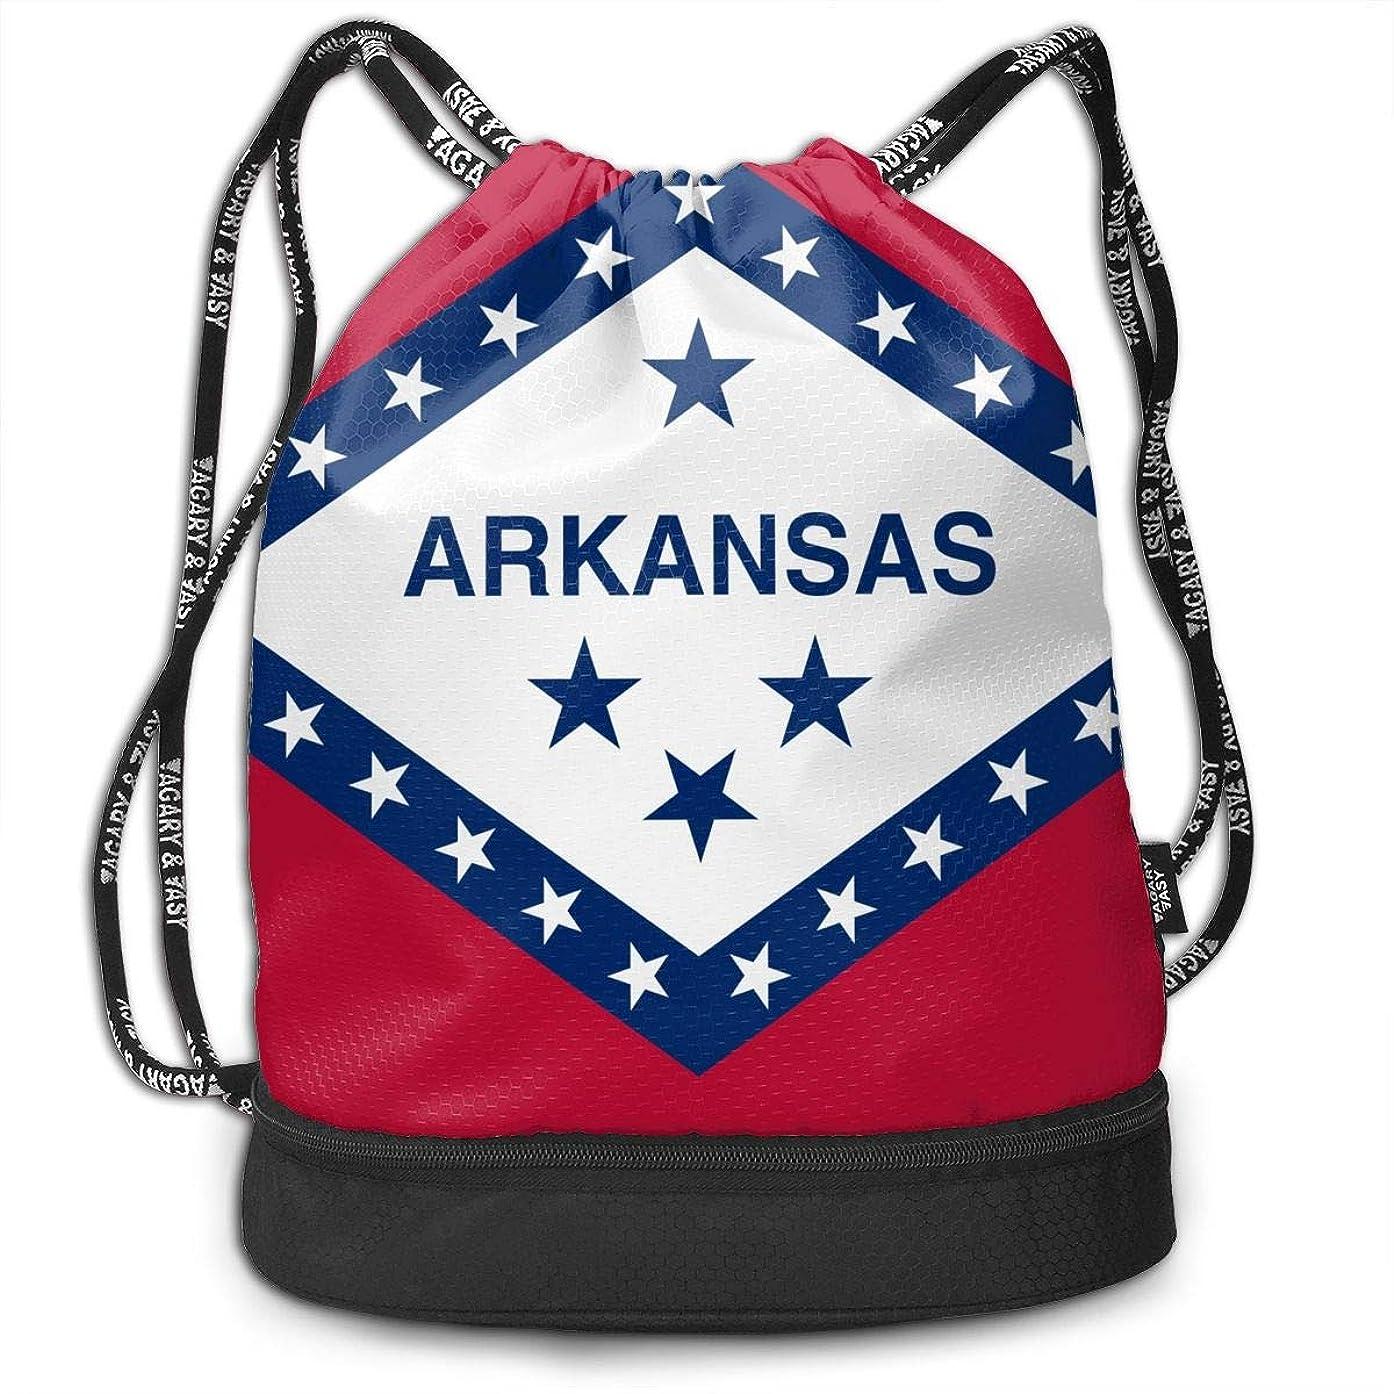 Tniy Flag of Arkansas Large Drawstring Sport Backpack,Sack Bag Sackpack